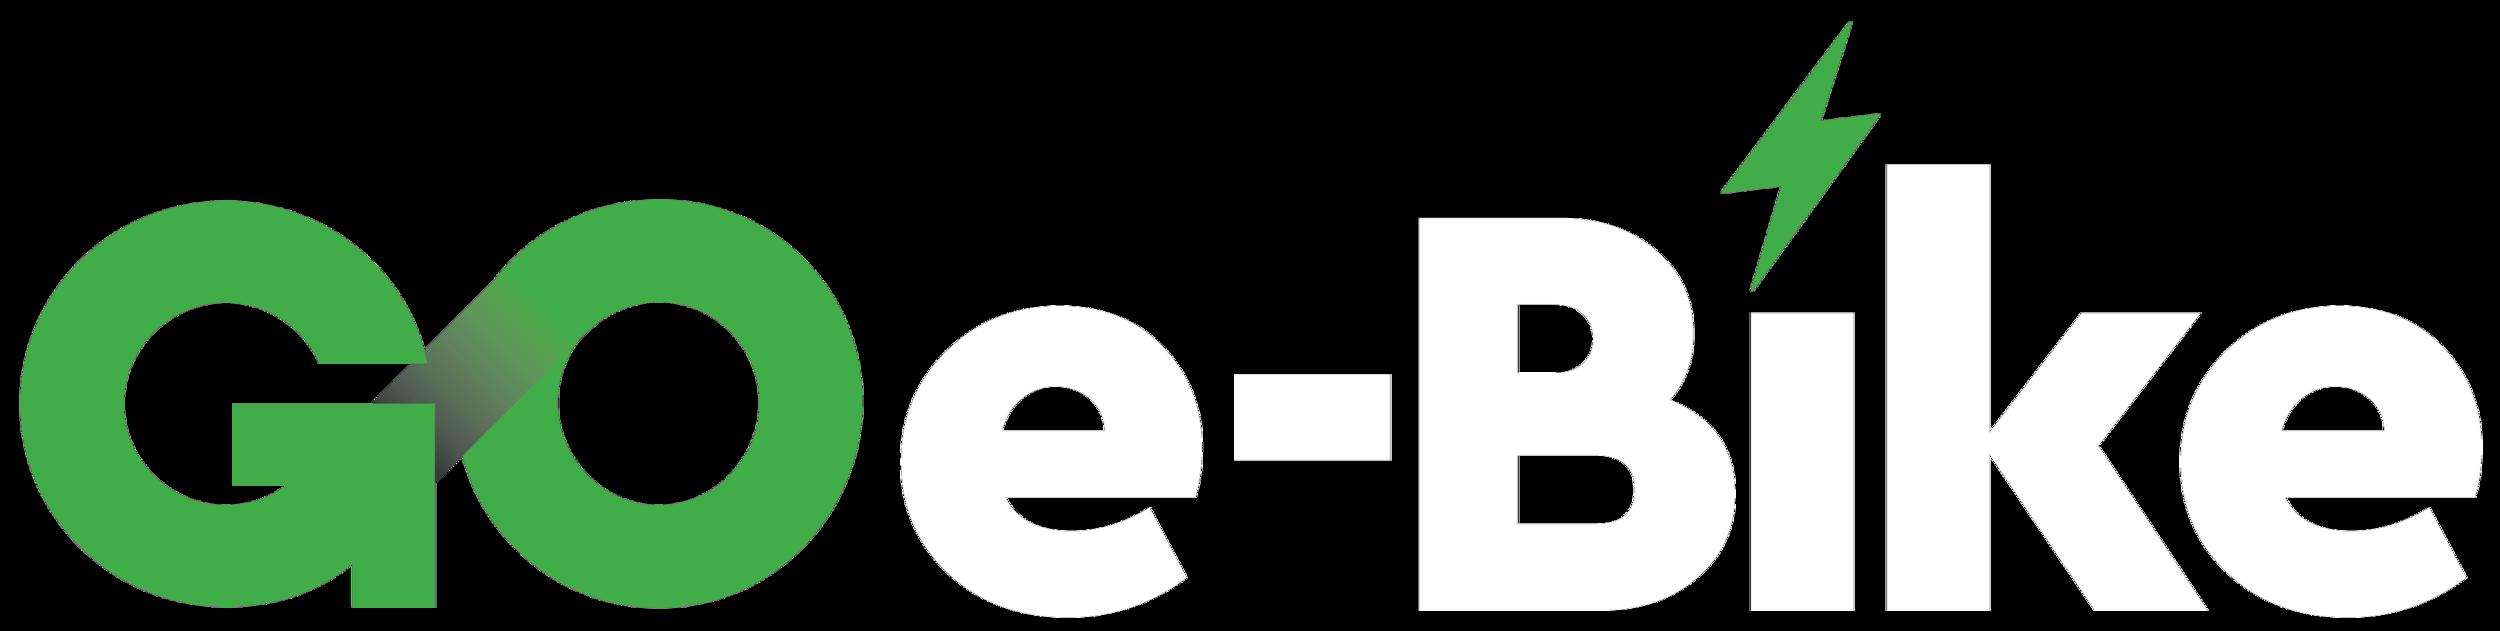 ebike_banner_logo.png